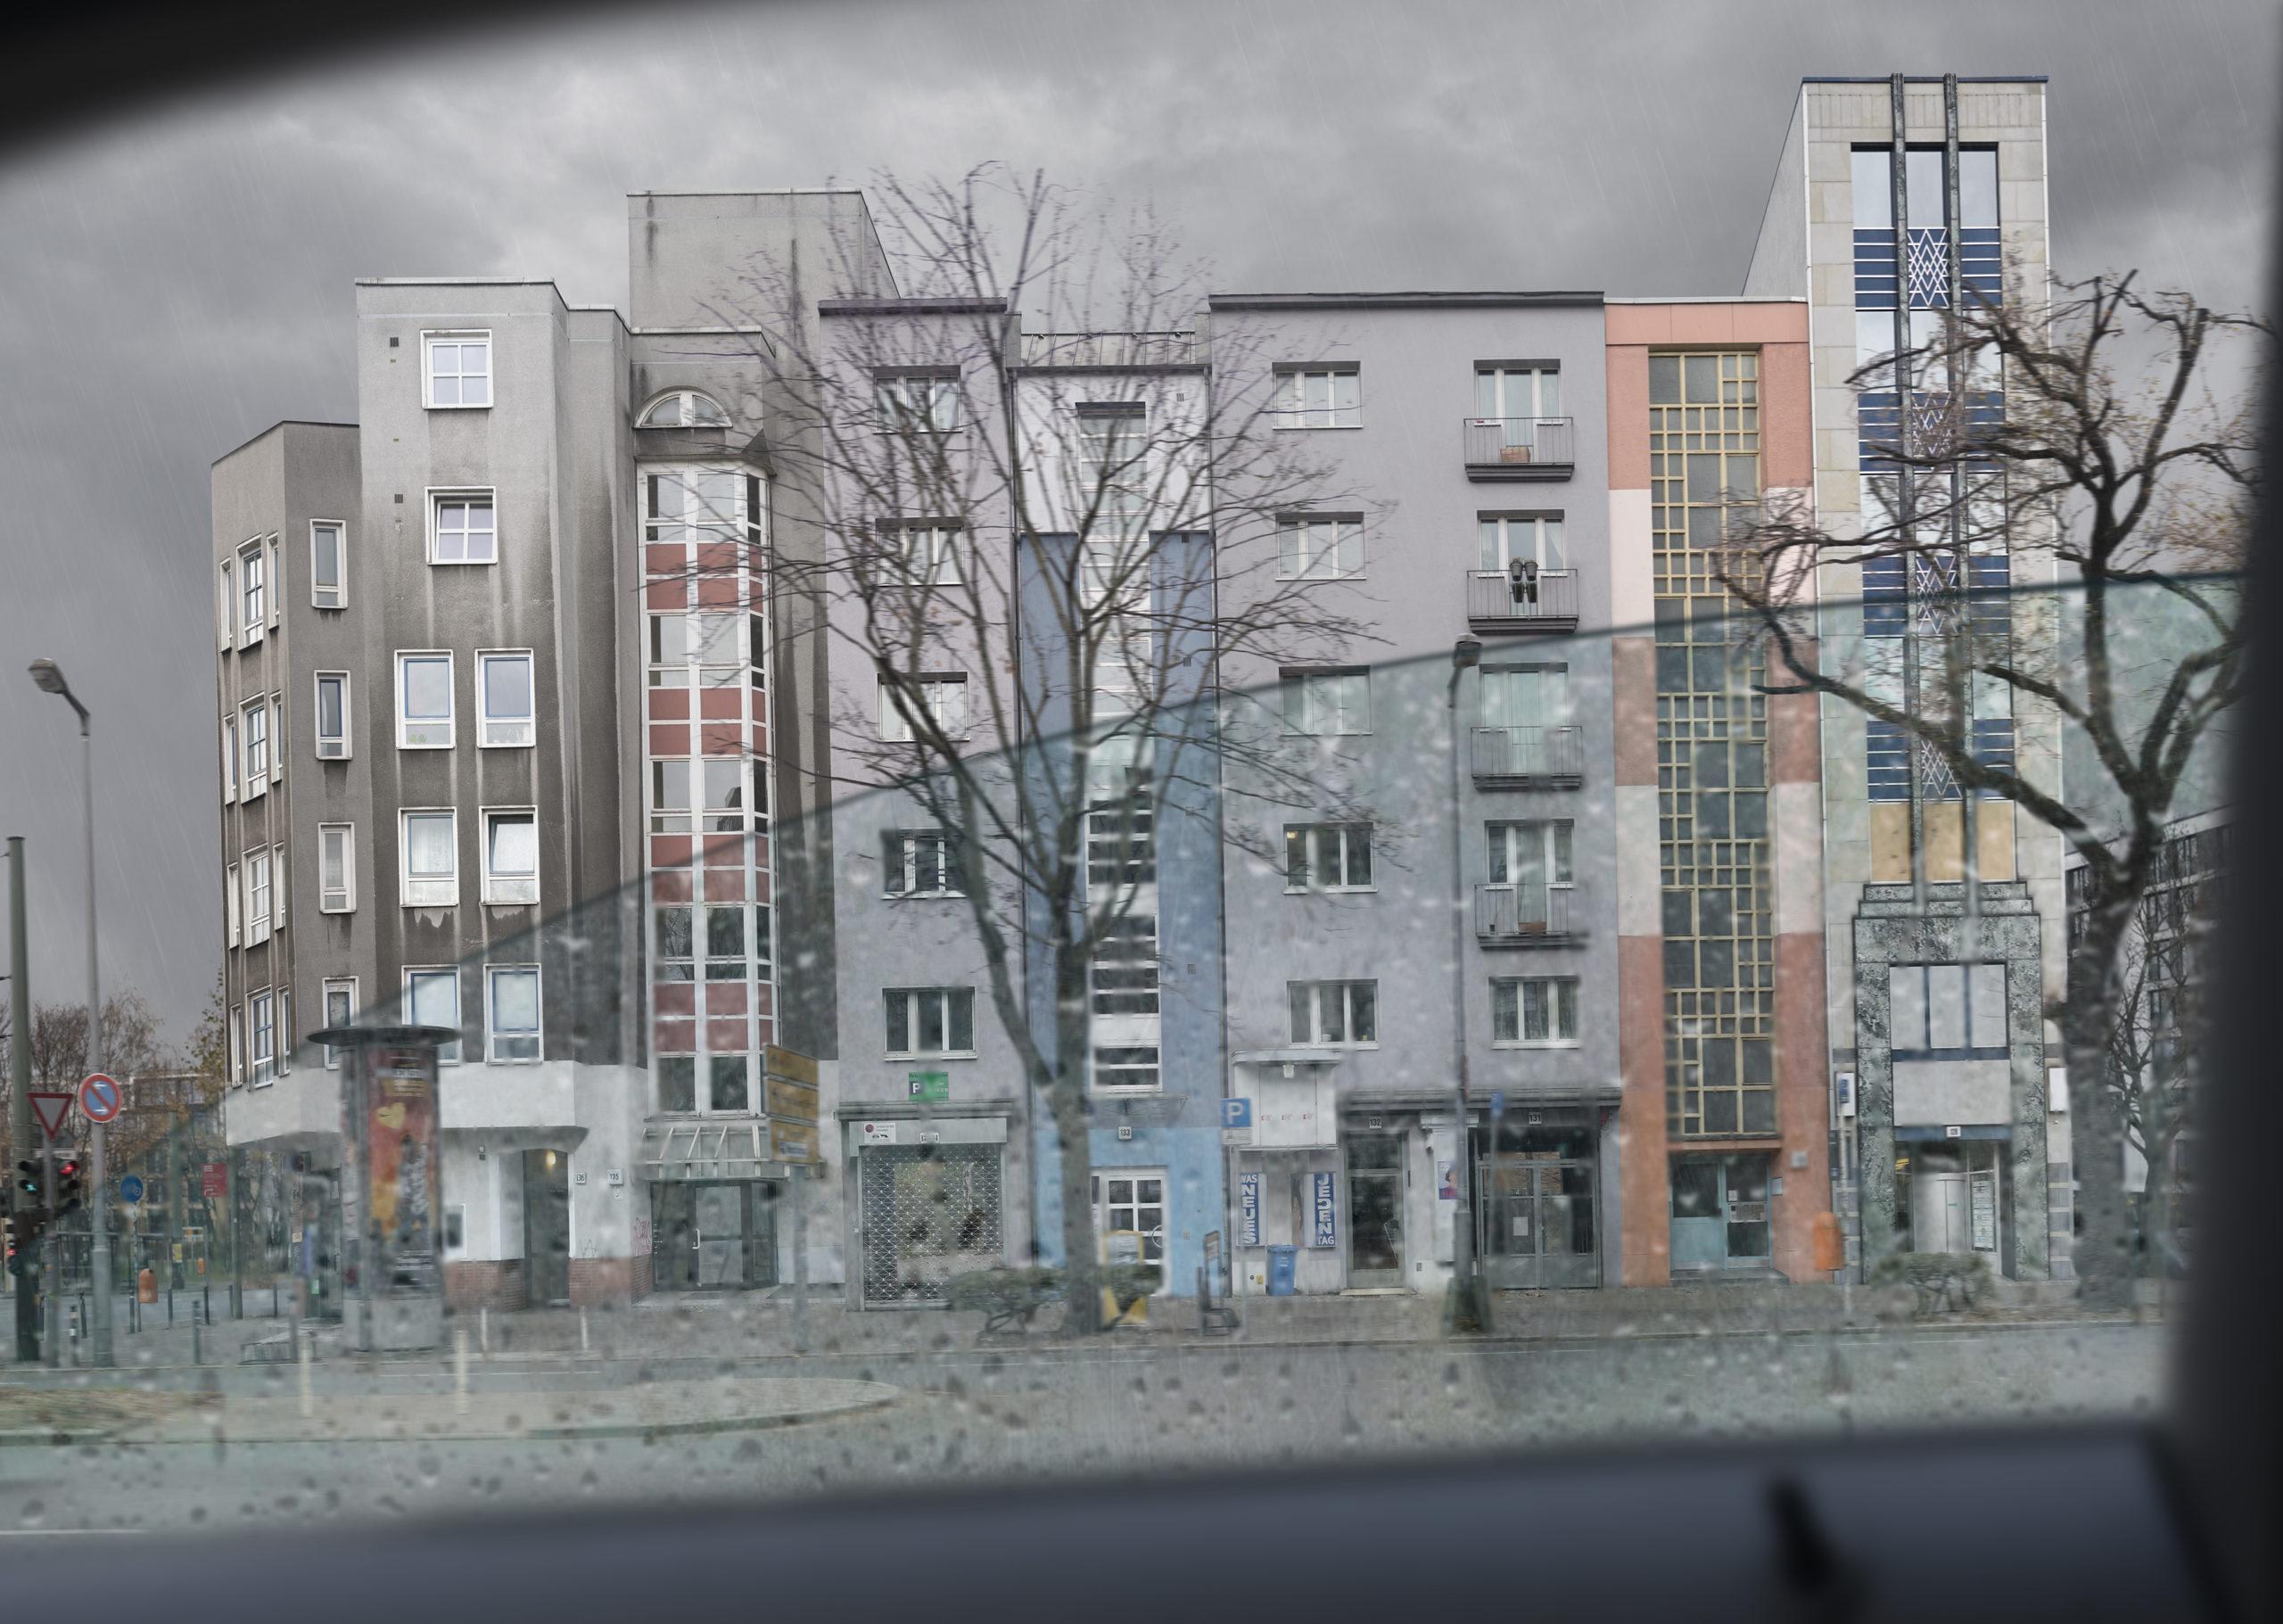 Dencity, Brunnenstrasse-Teil1, Berlin